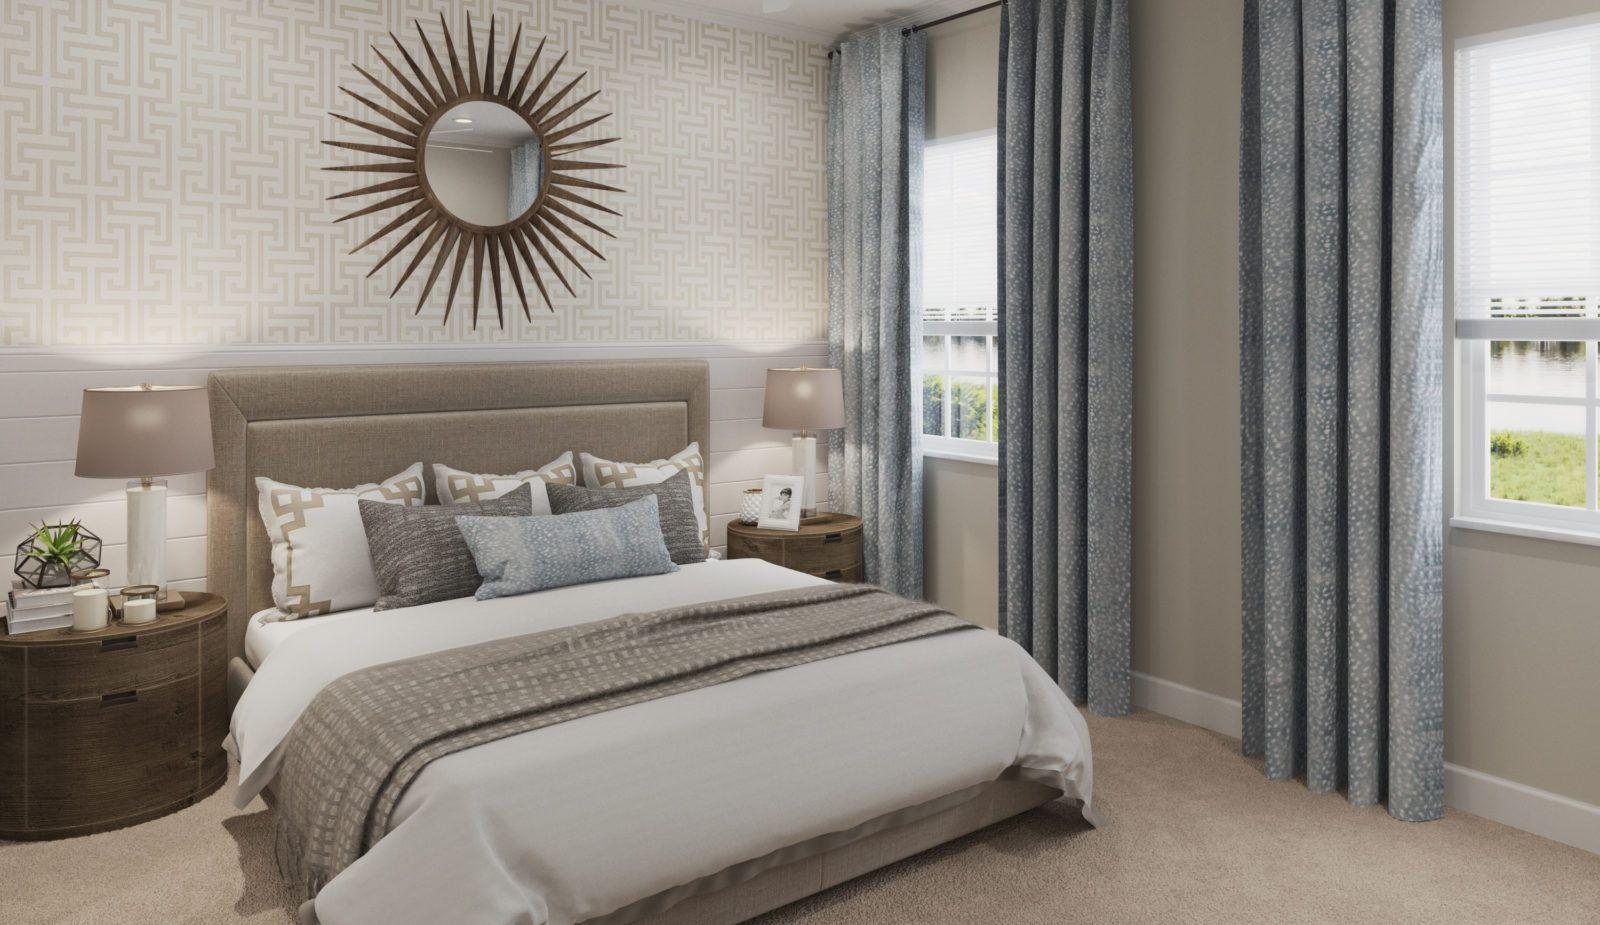 Bedroom featured in the Augusta By Neal Communities in Punta Gorda, FL